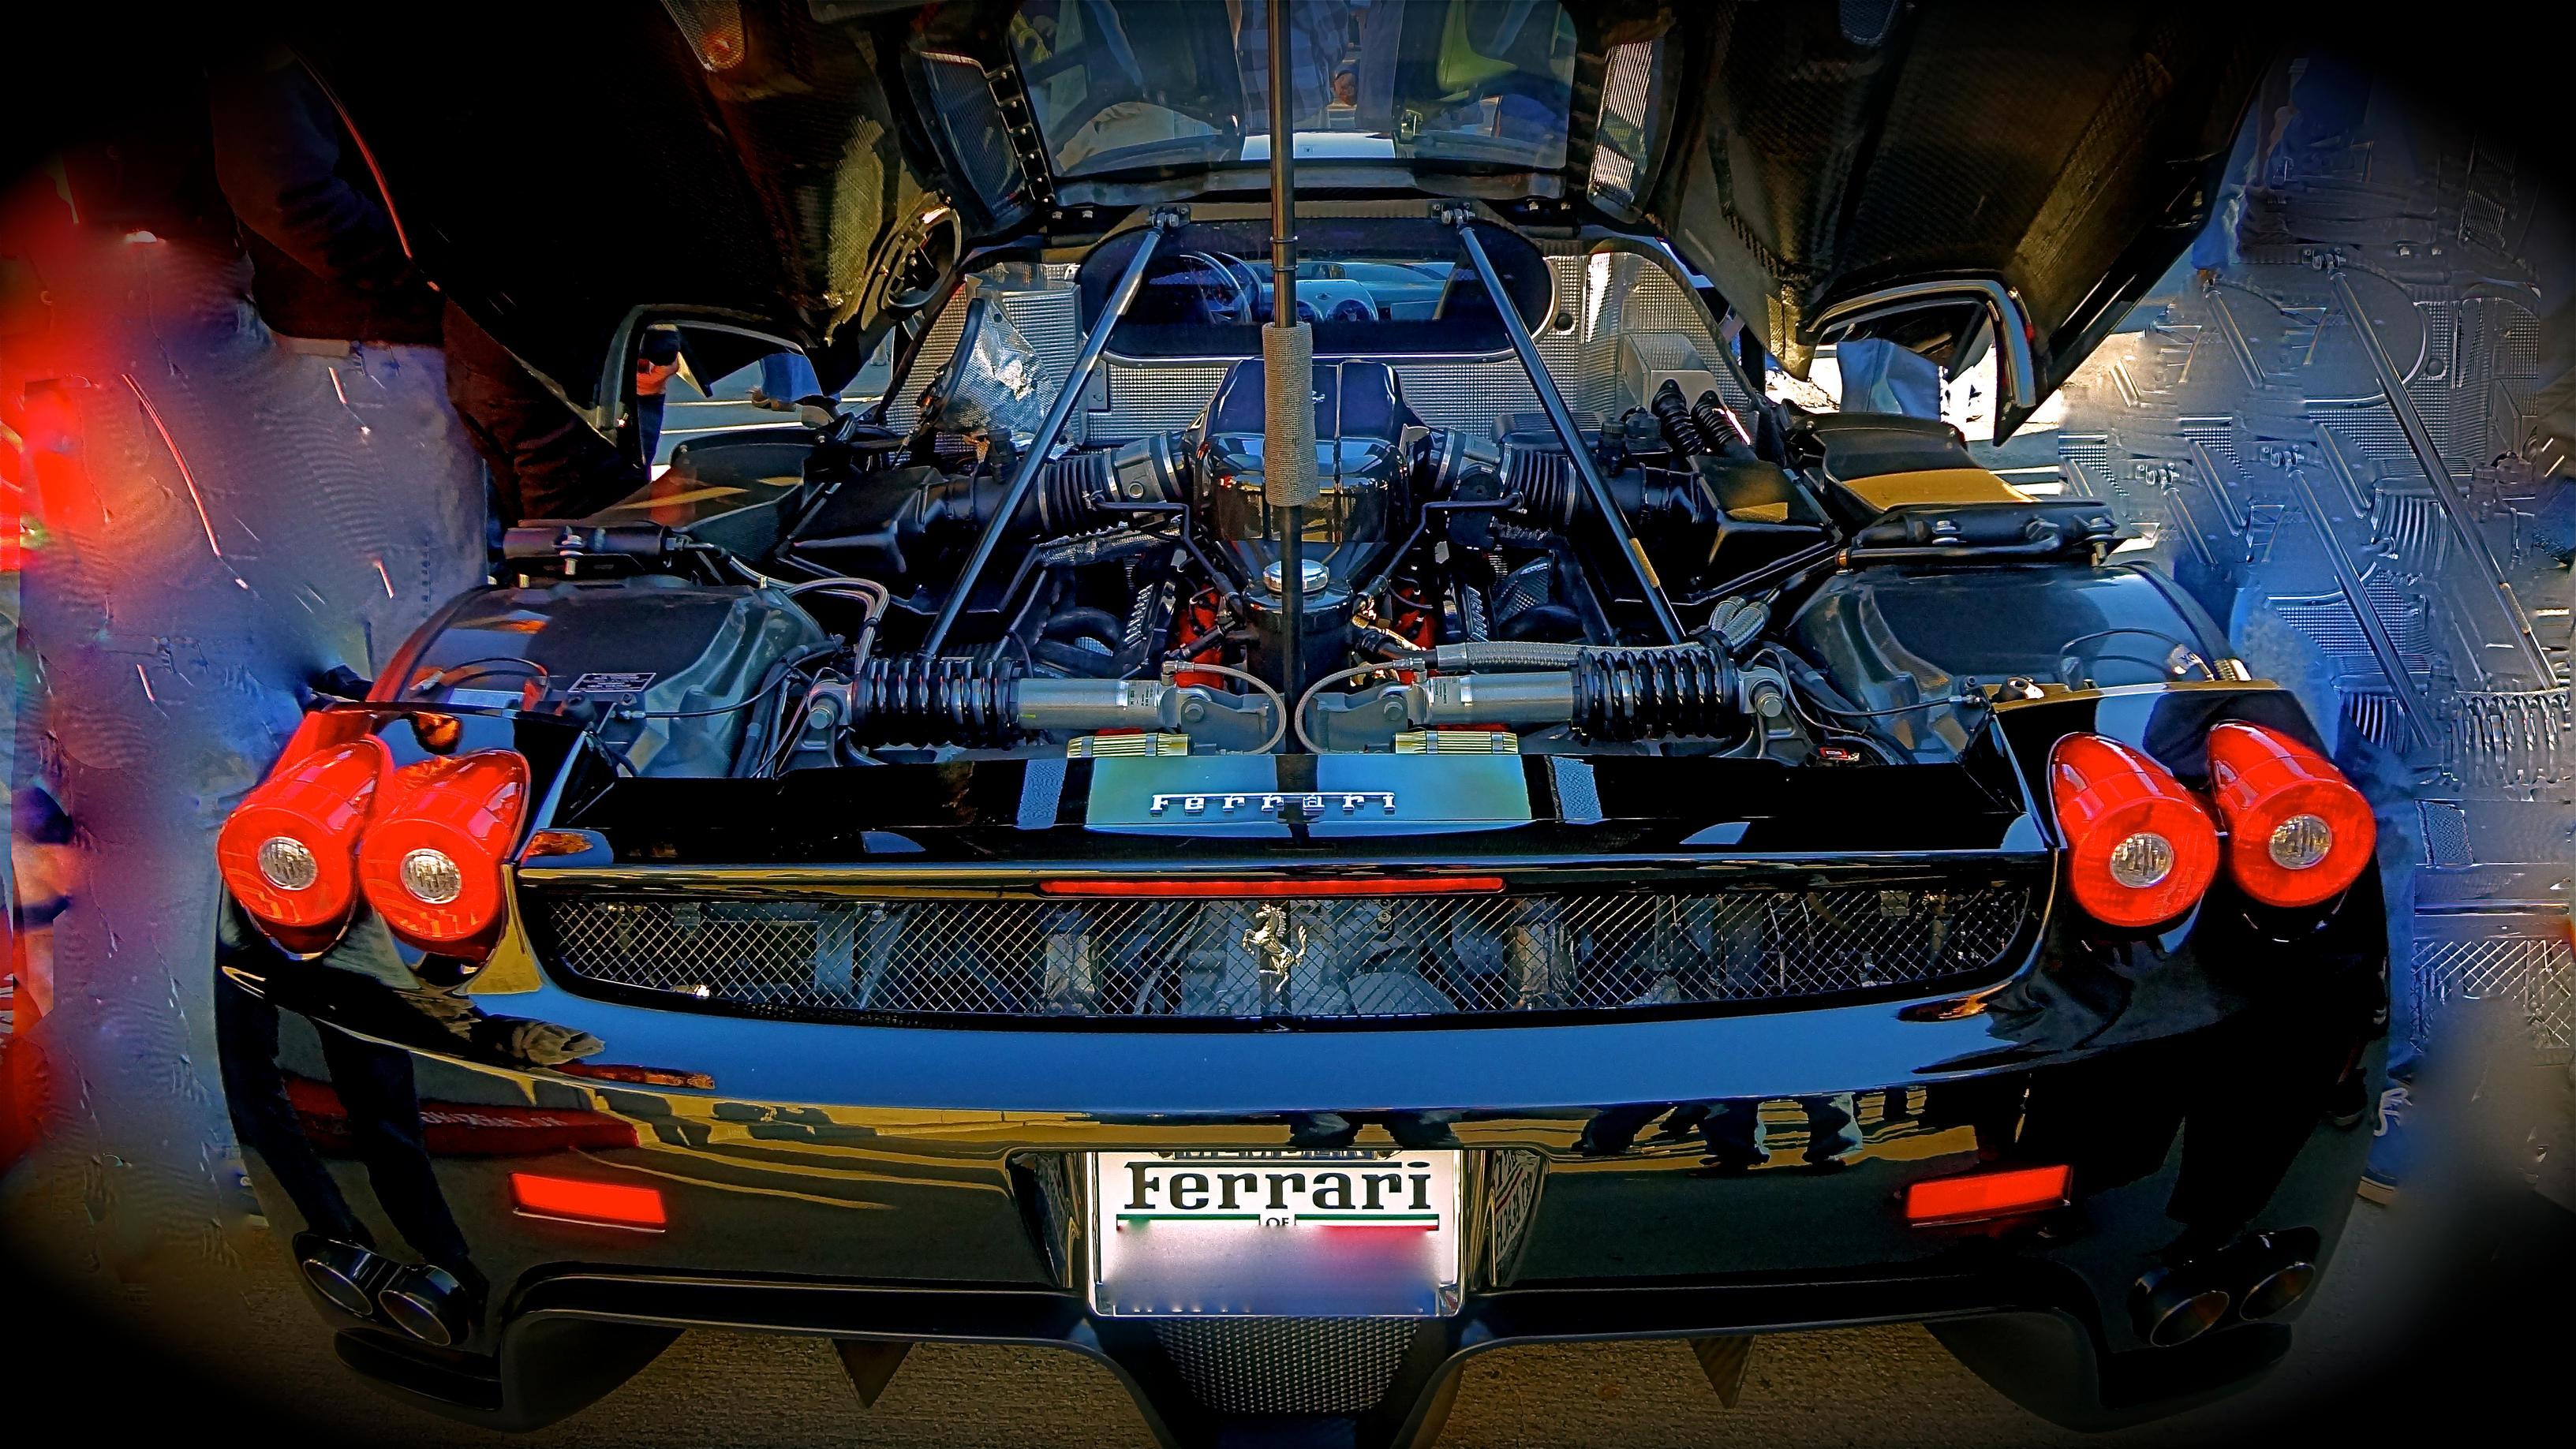 Ferrari Enzo engine bay by MercilessOne on DeviantArt